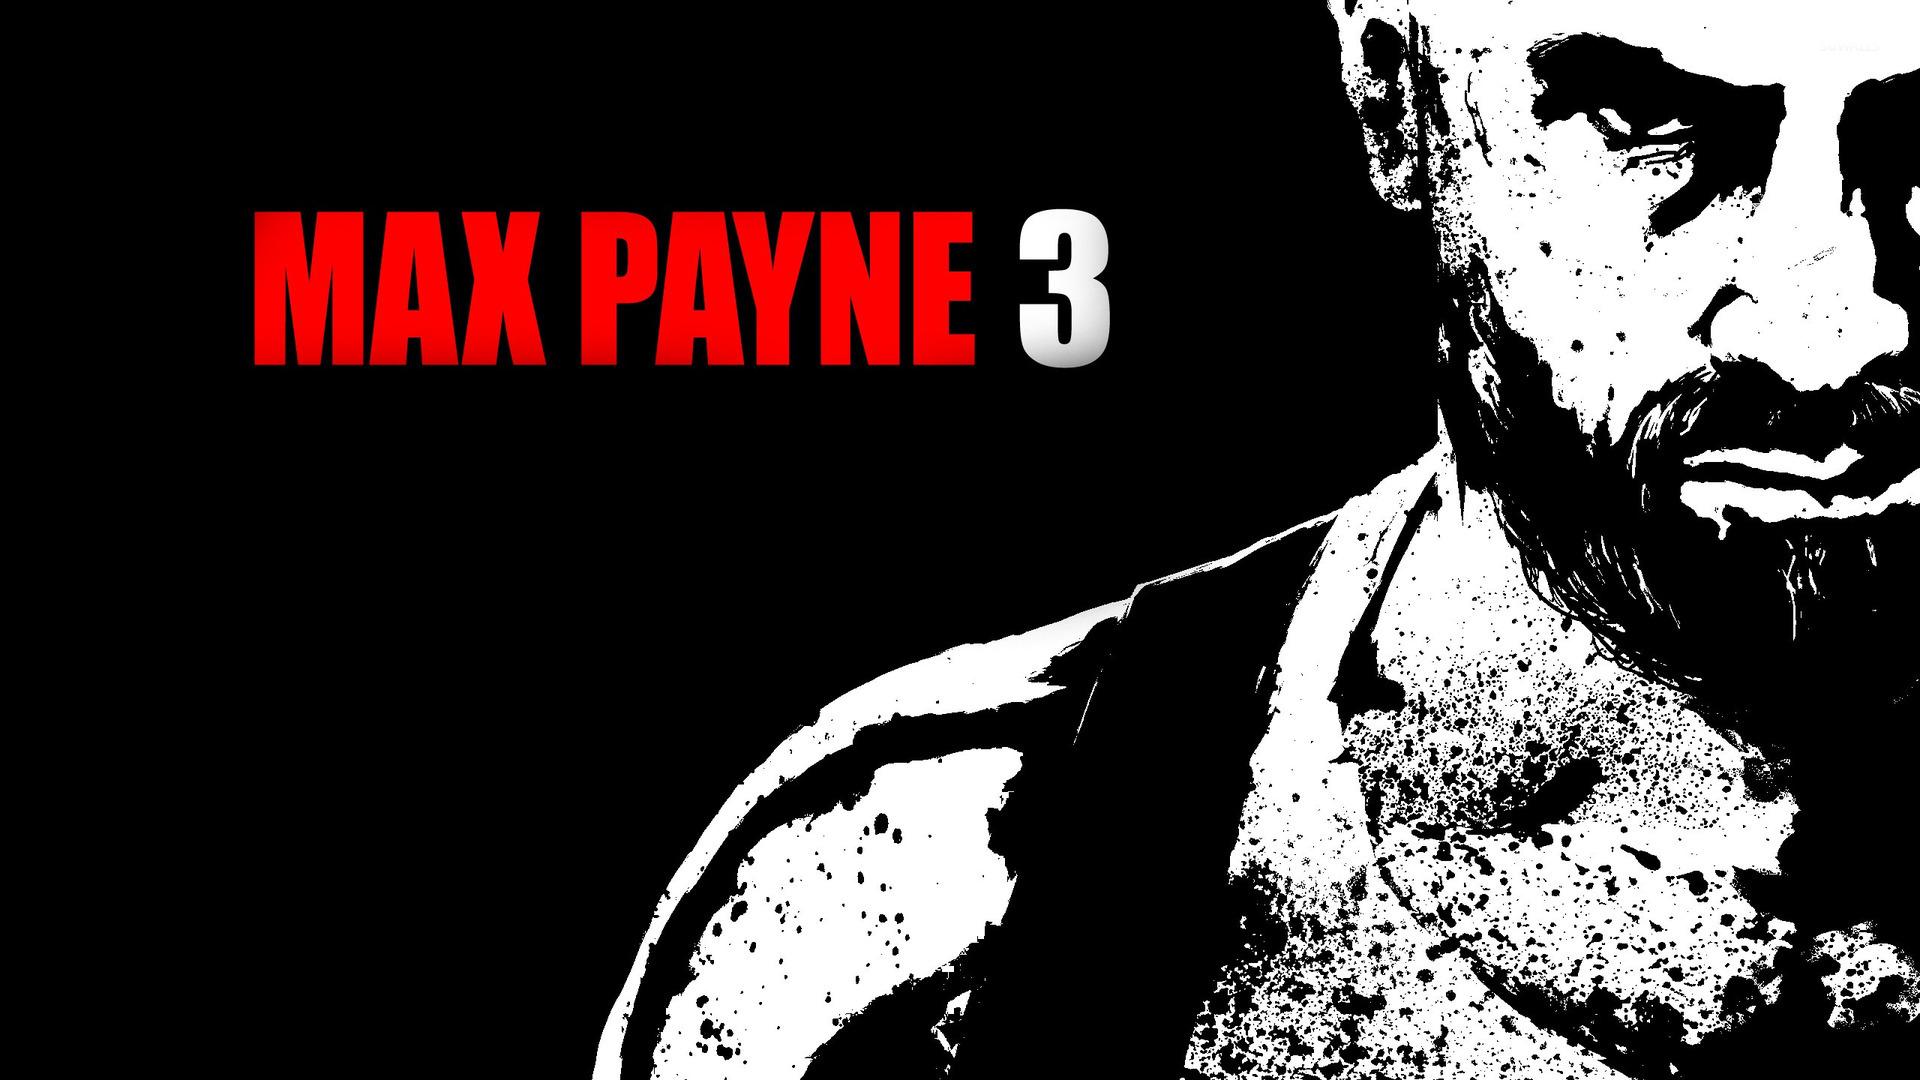 Max Payne 3 wallpaper   Game wallpapers   16141 1920x1080